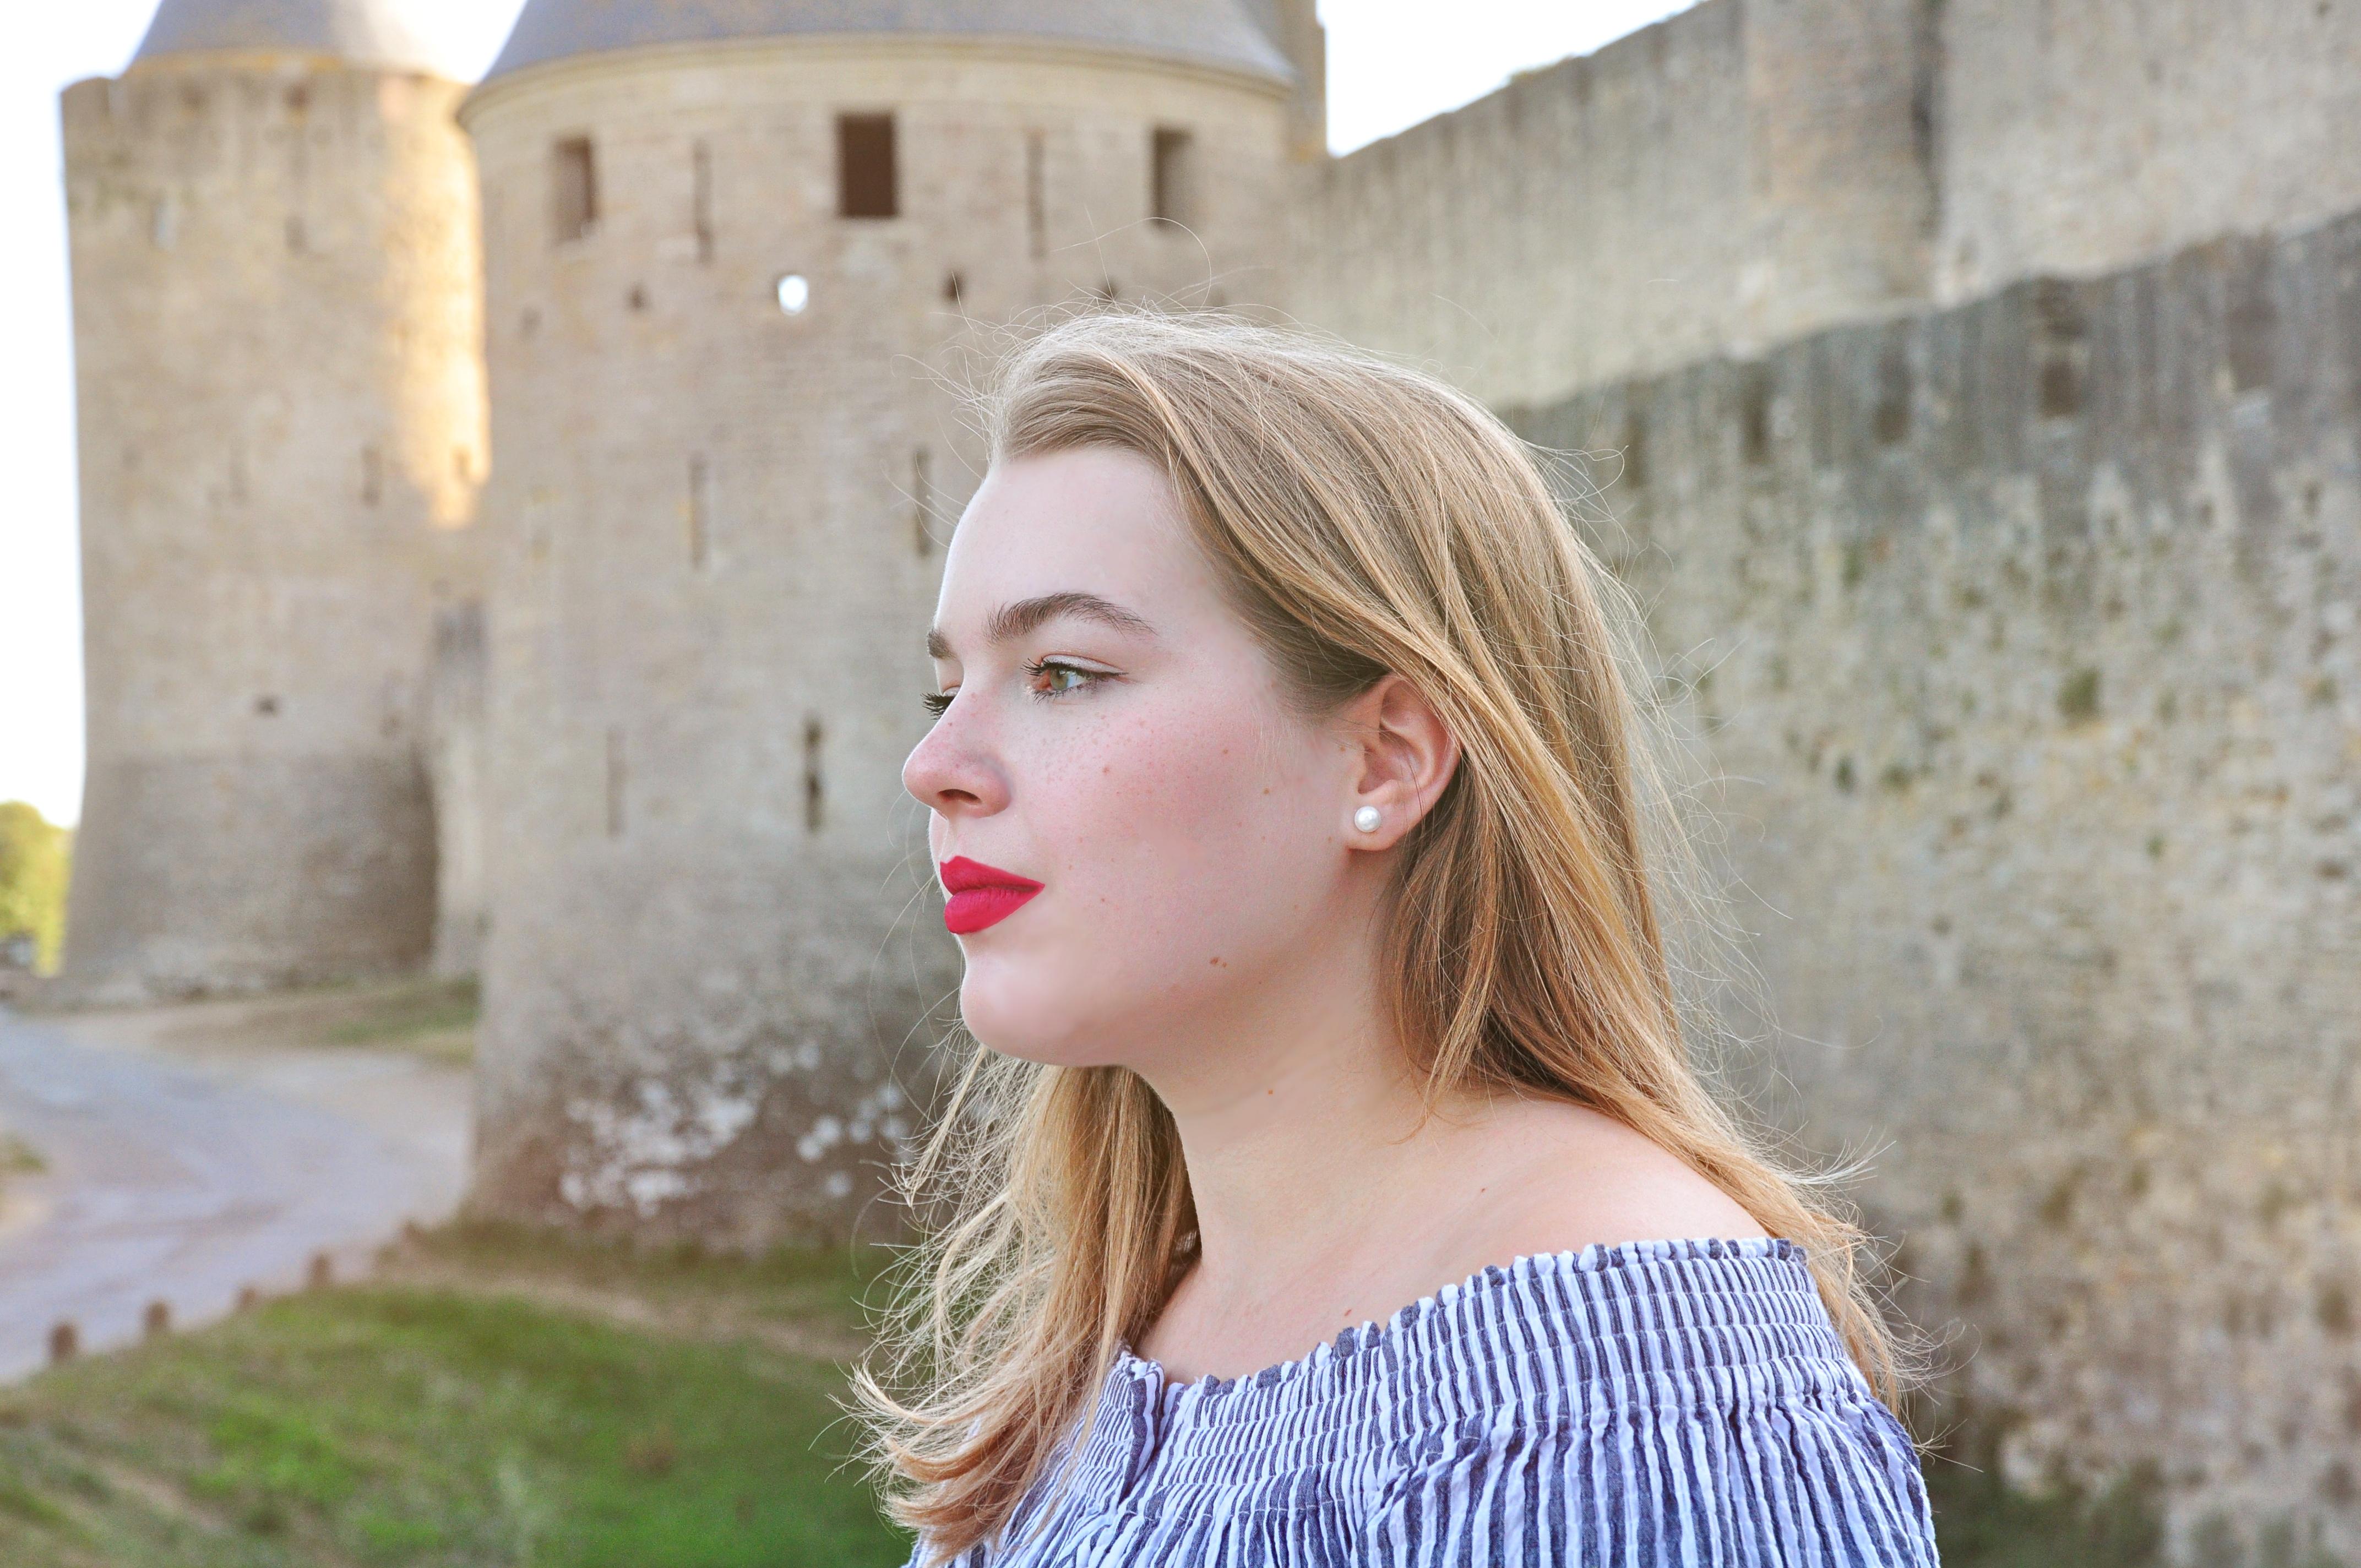 Ksenia Ignatenko